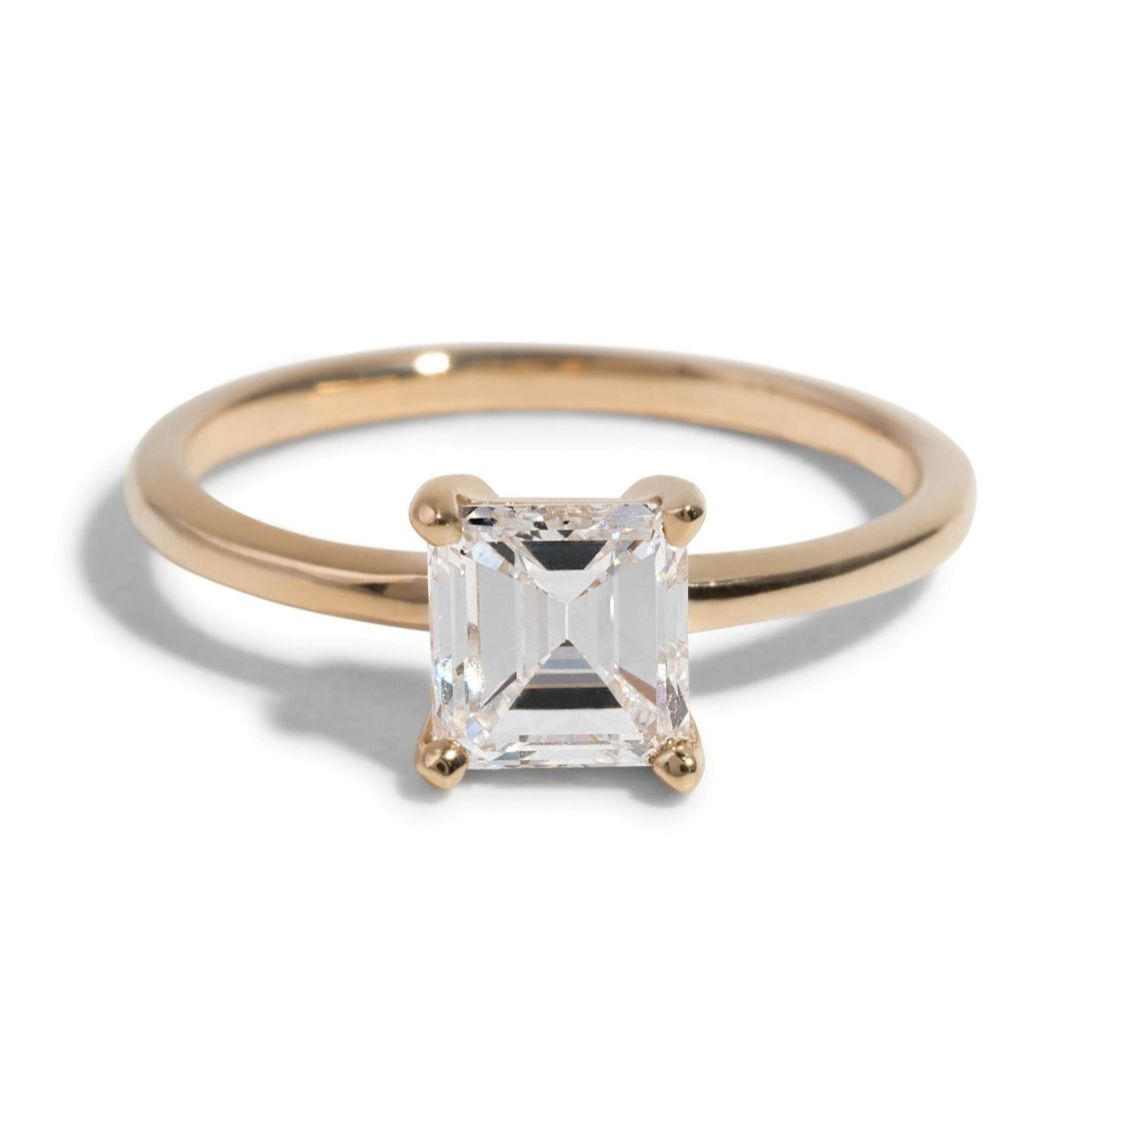 Bario Neal Custom Heirloom Asscher Cut Solitaire Engagement Ring